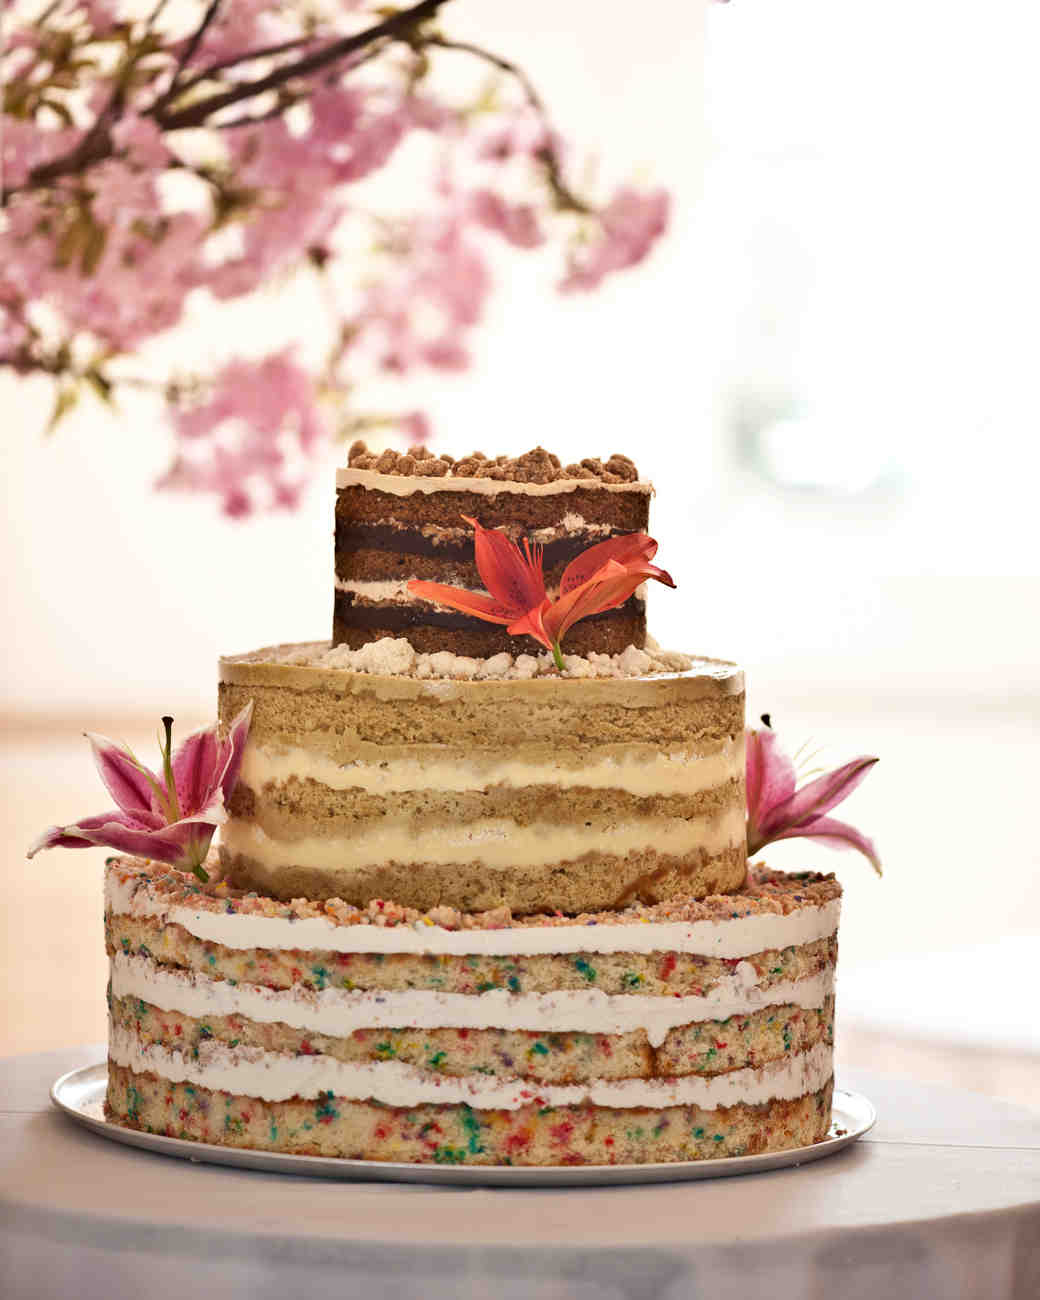 milk-bar-cake-muller-wedding-cake-0415.jpg